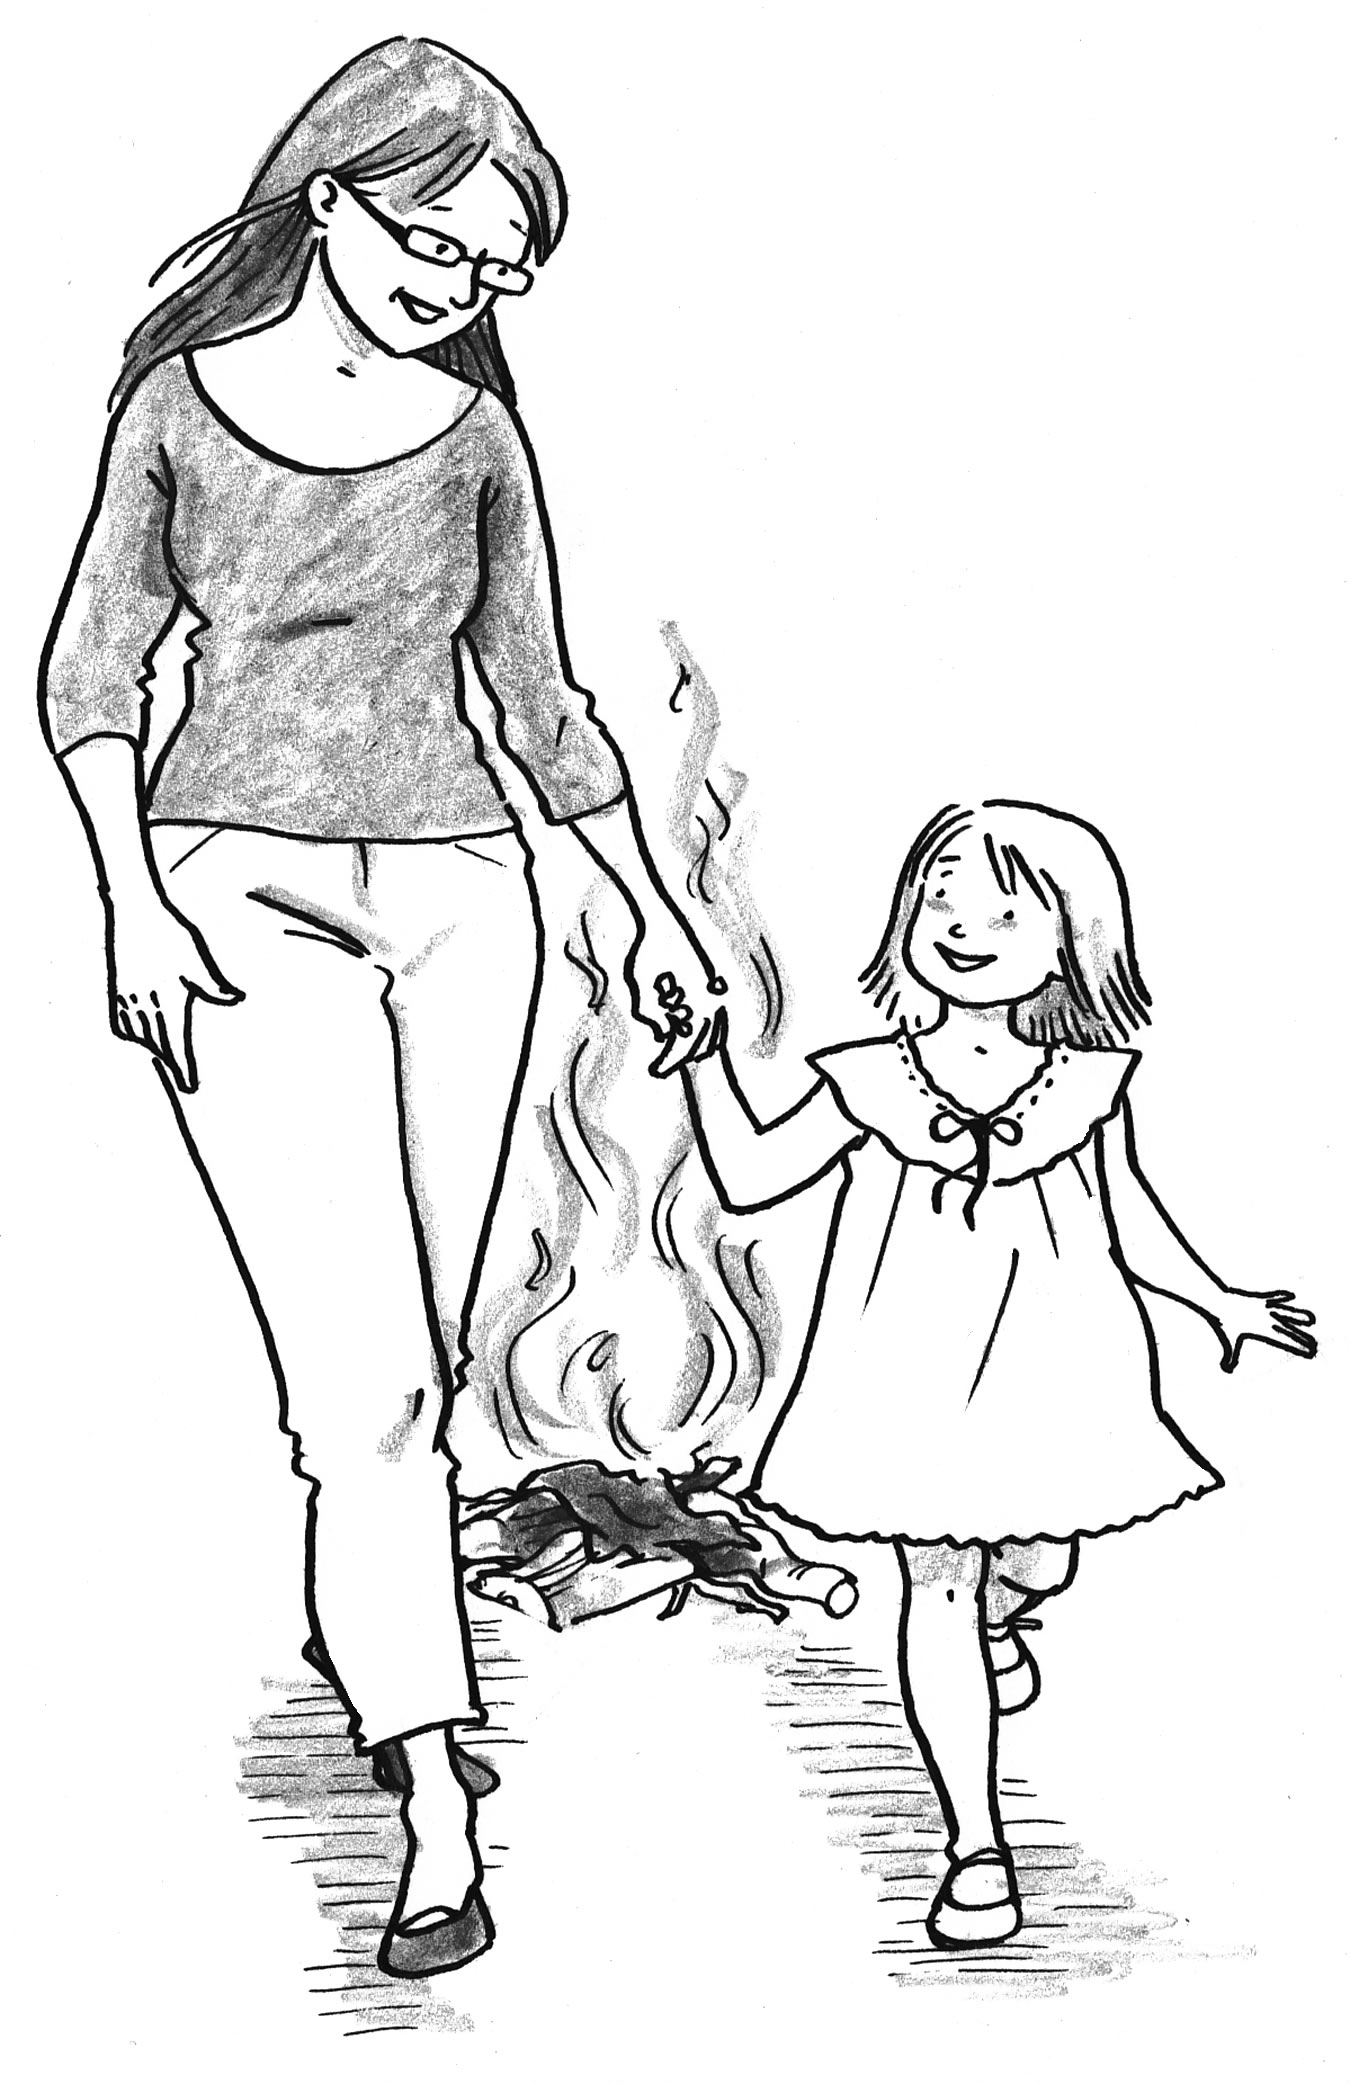 Dress-burned